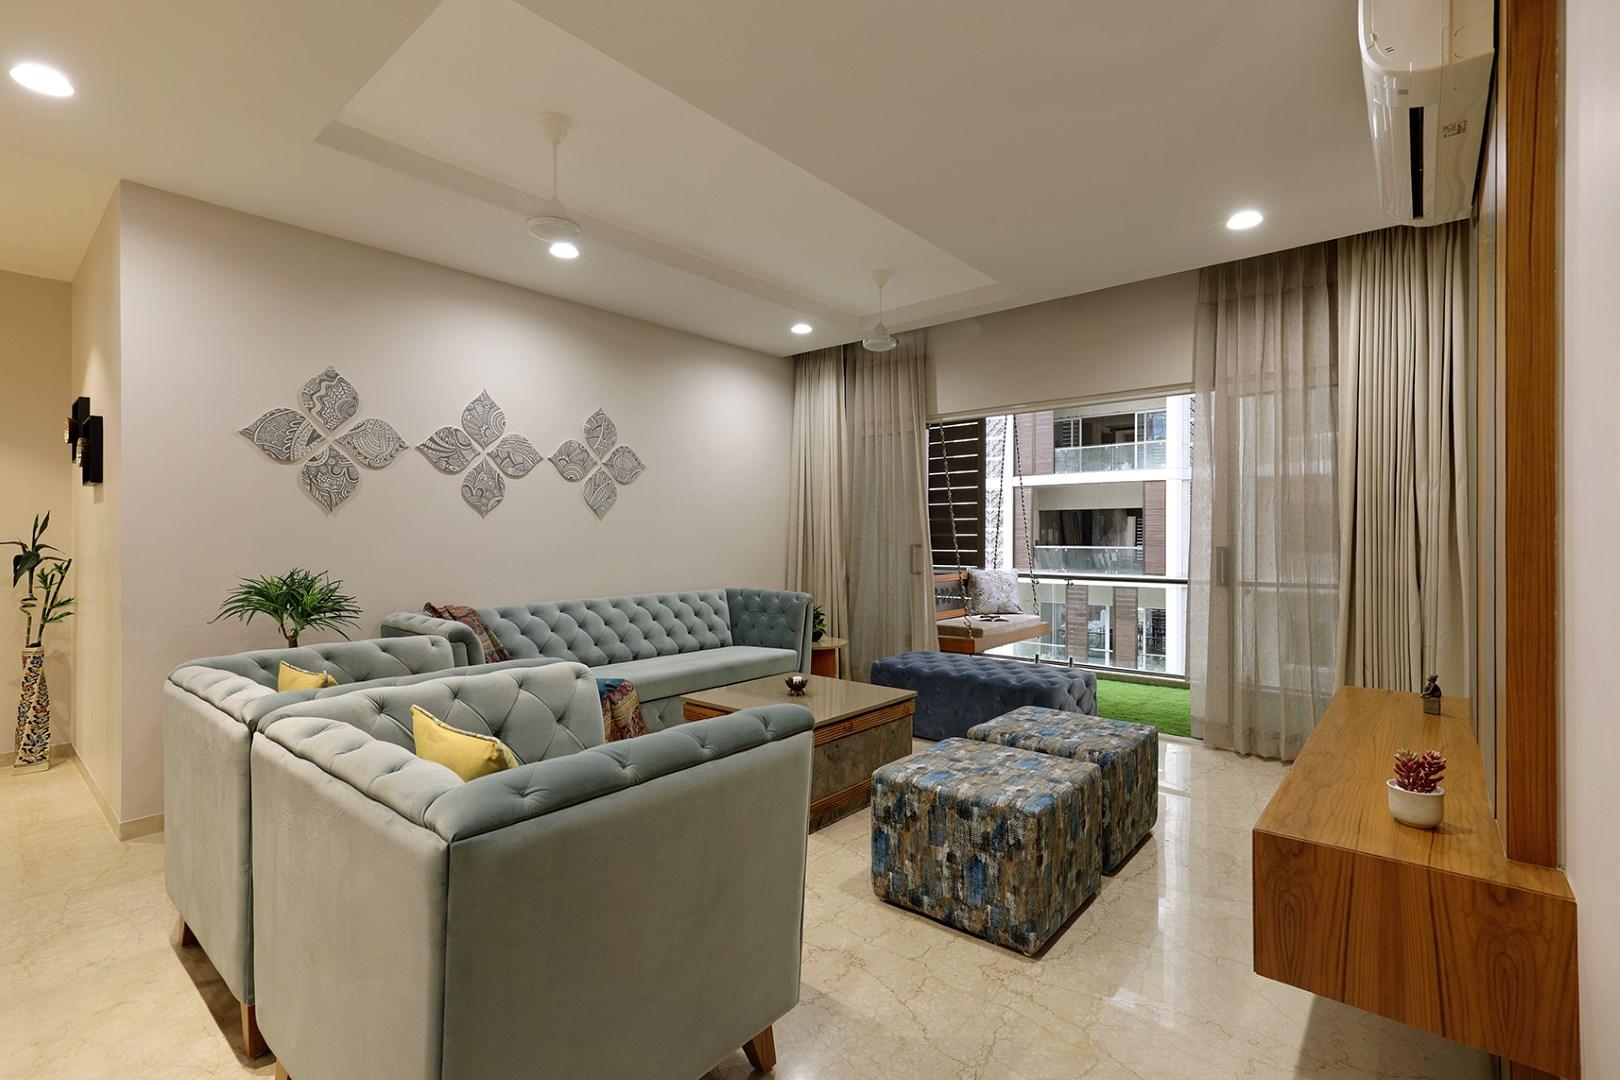 Floral Pattern Inspires Apartment Interiors|Studio 7 - The ...